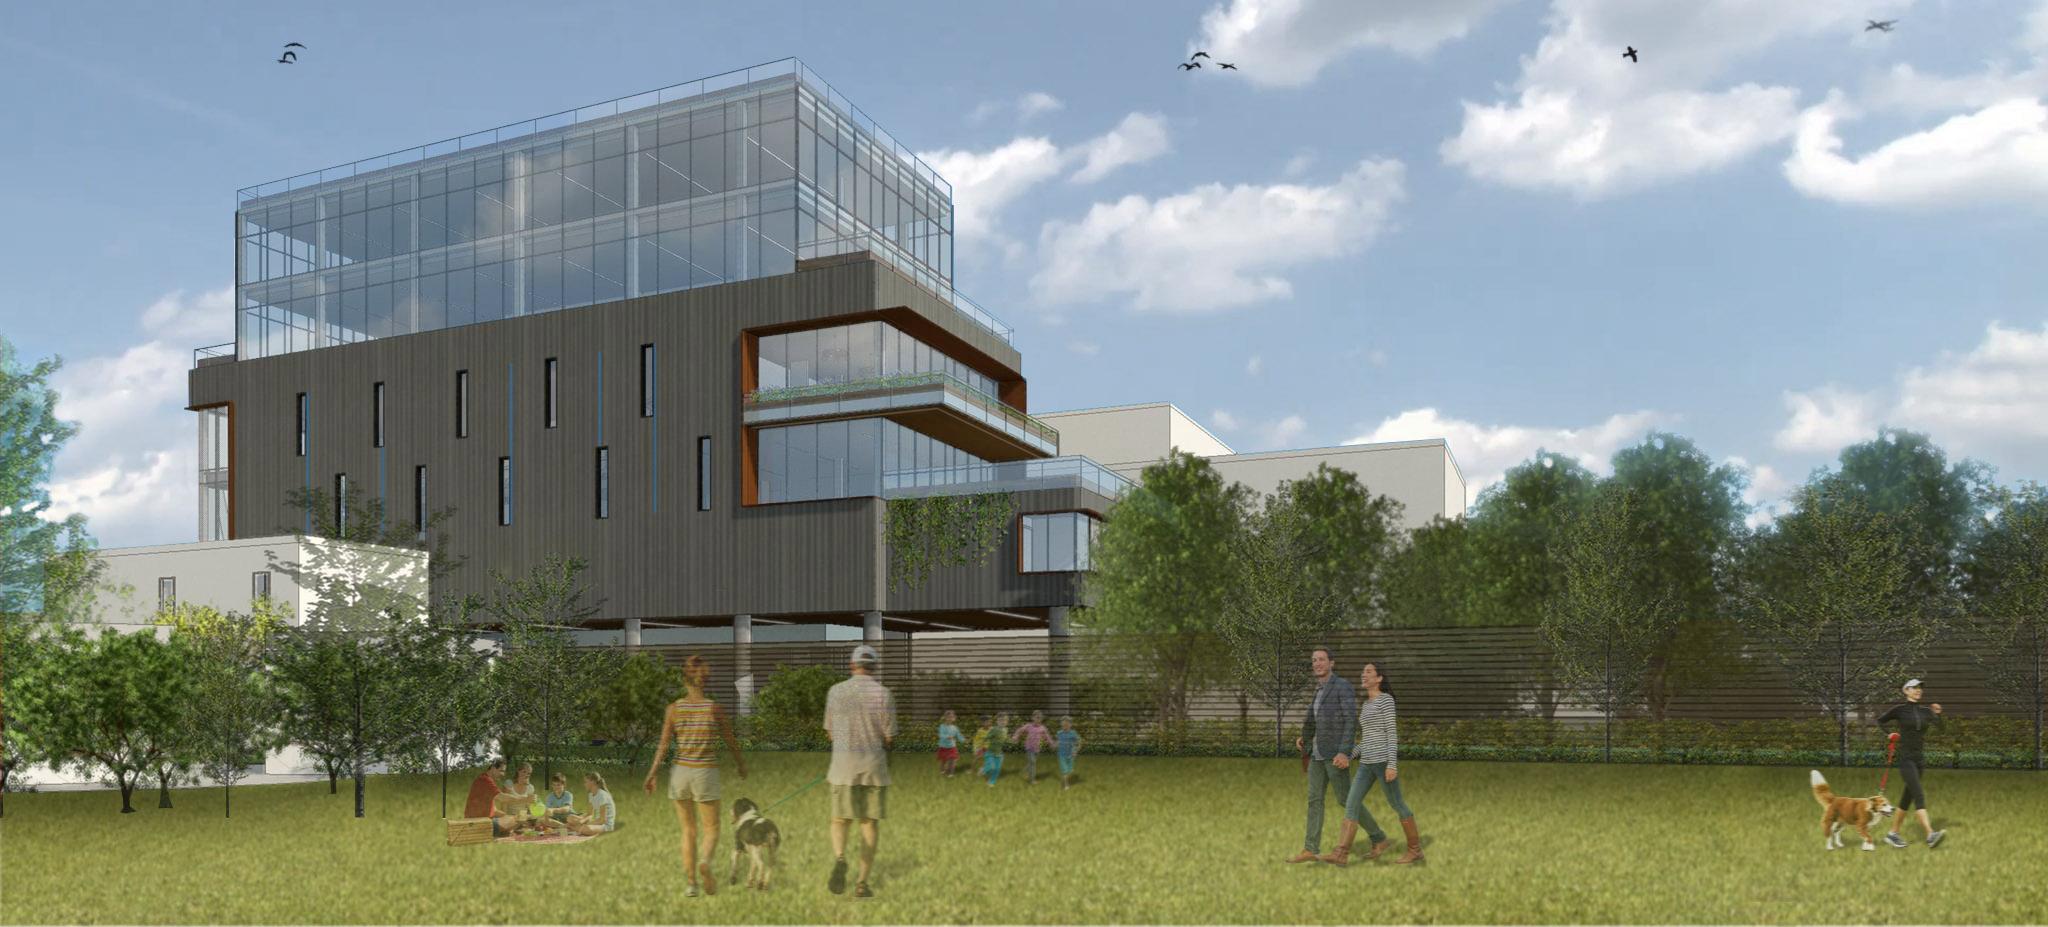 Toront-Dance-Music-School-architecture.jpg